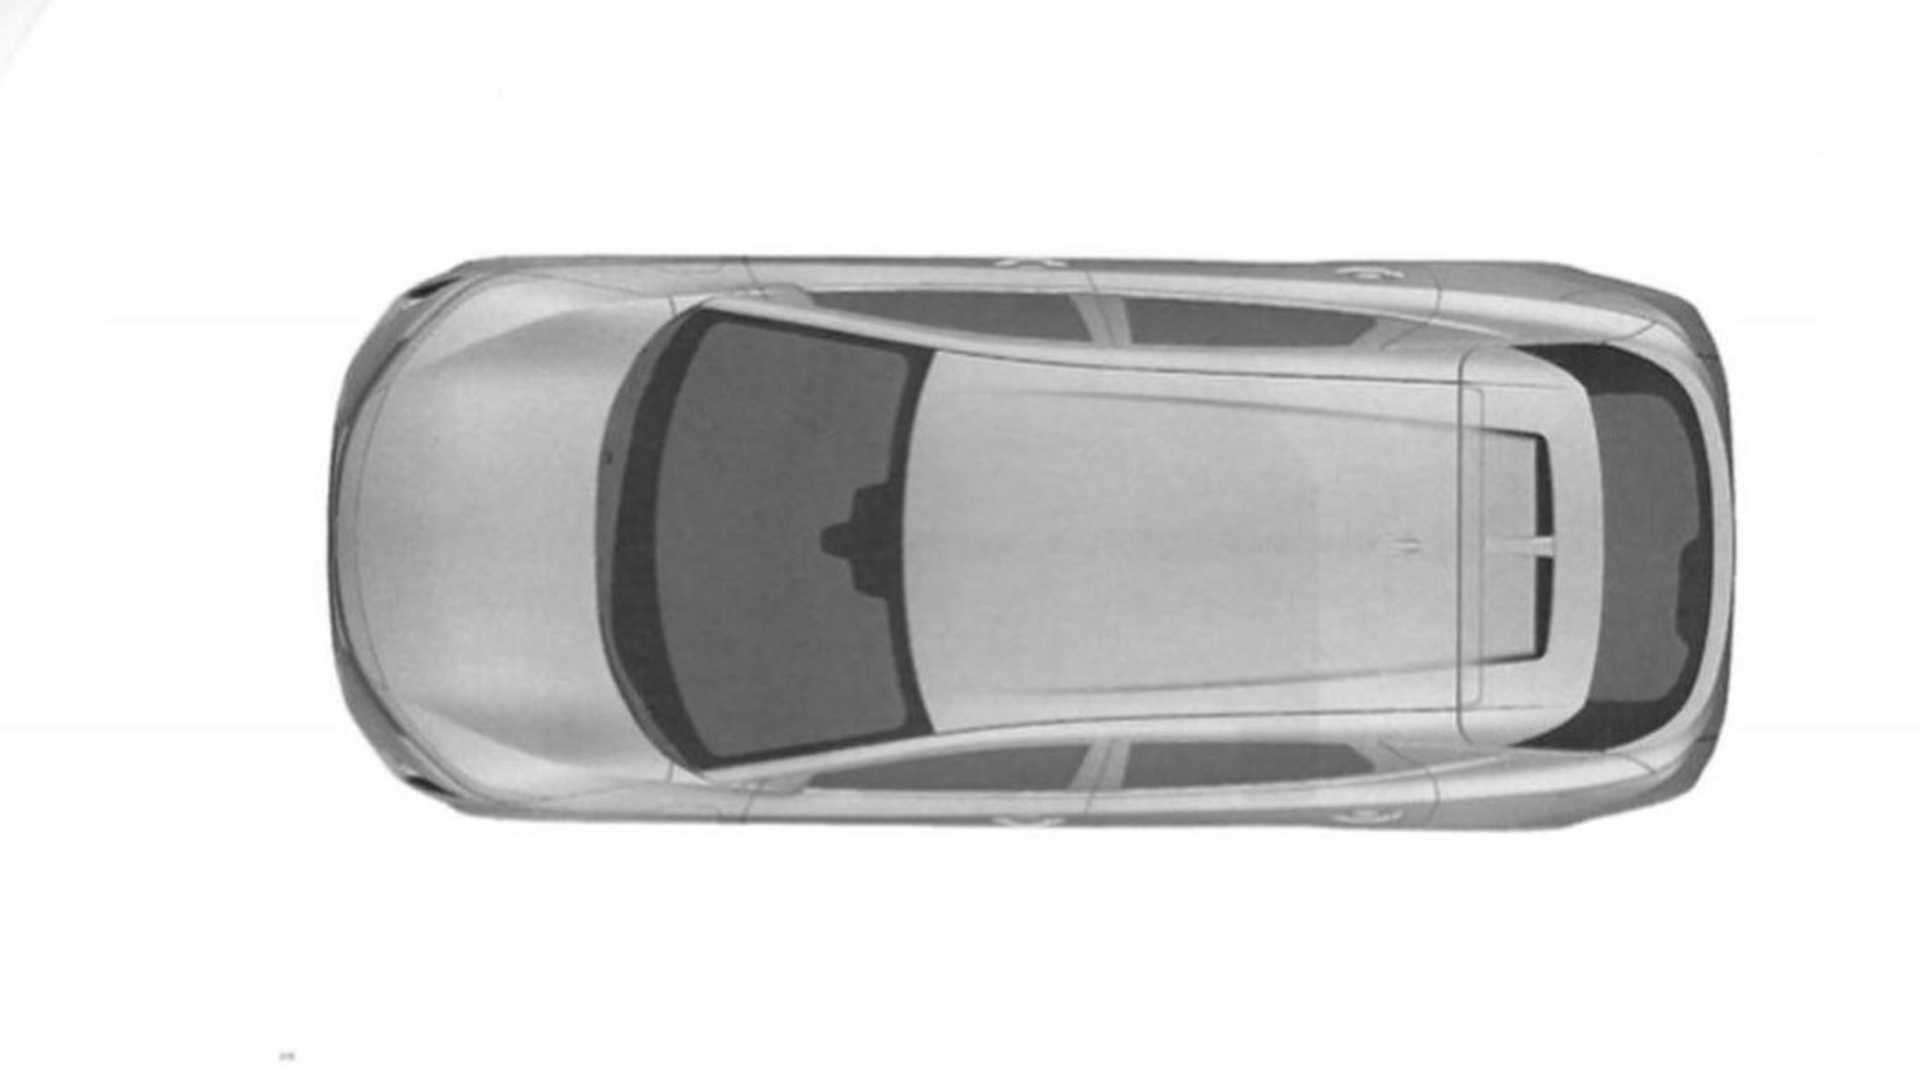 Nissan_Ariya_sketch_patent_0005